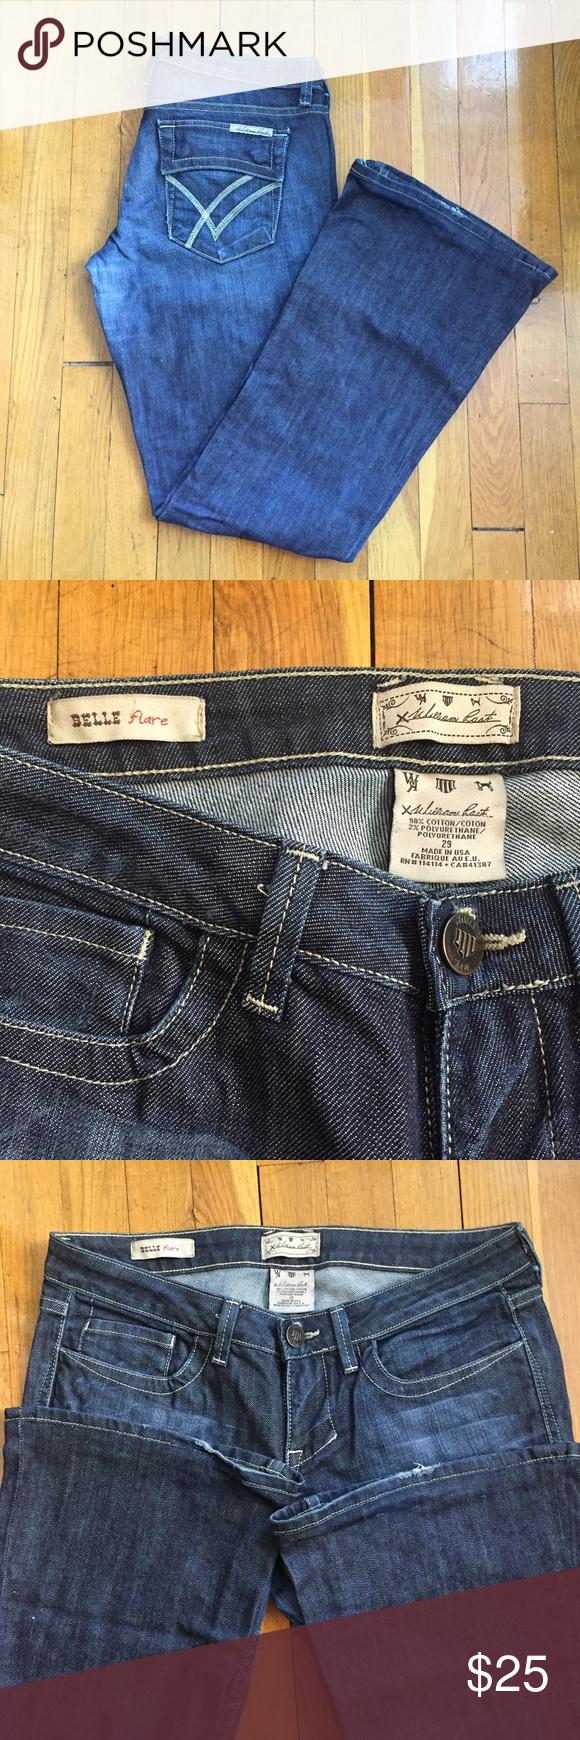 "William Rast Belle Flare Jeans - Sz. 29 Please note jeans were professionally hemmed - see last picture - original hem was kept. New inseam is approximately 31"". Very cute low rise, flare jeans! William Rast Jeans Flare & Wide Leg"